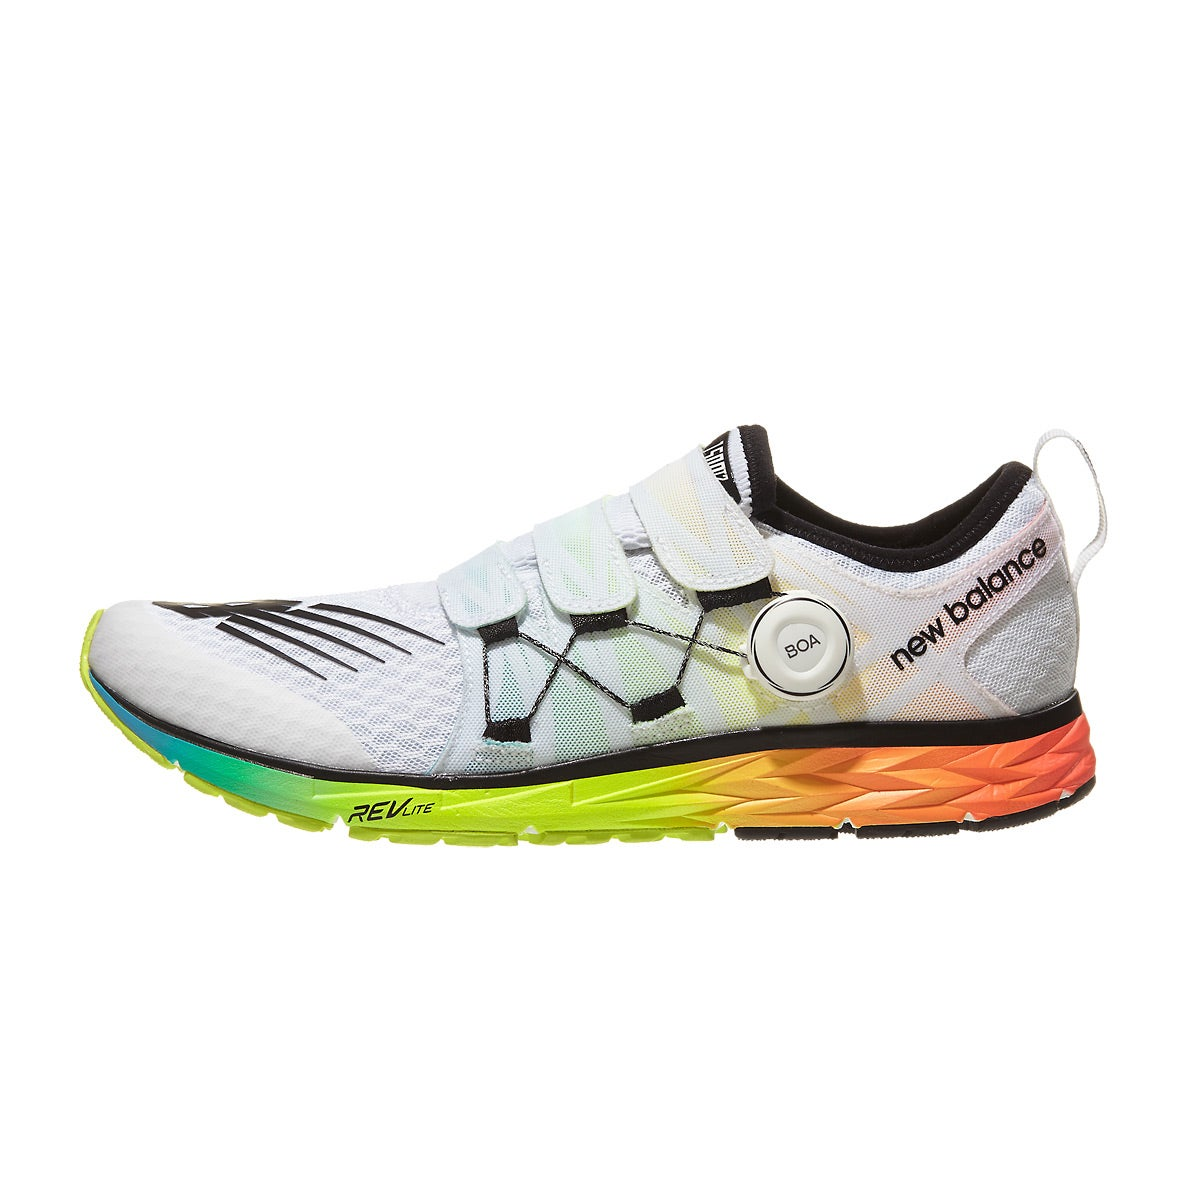 New Balance NBX 1500 v4 Kona BOA Lace Men Shoes White 360° View ...